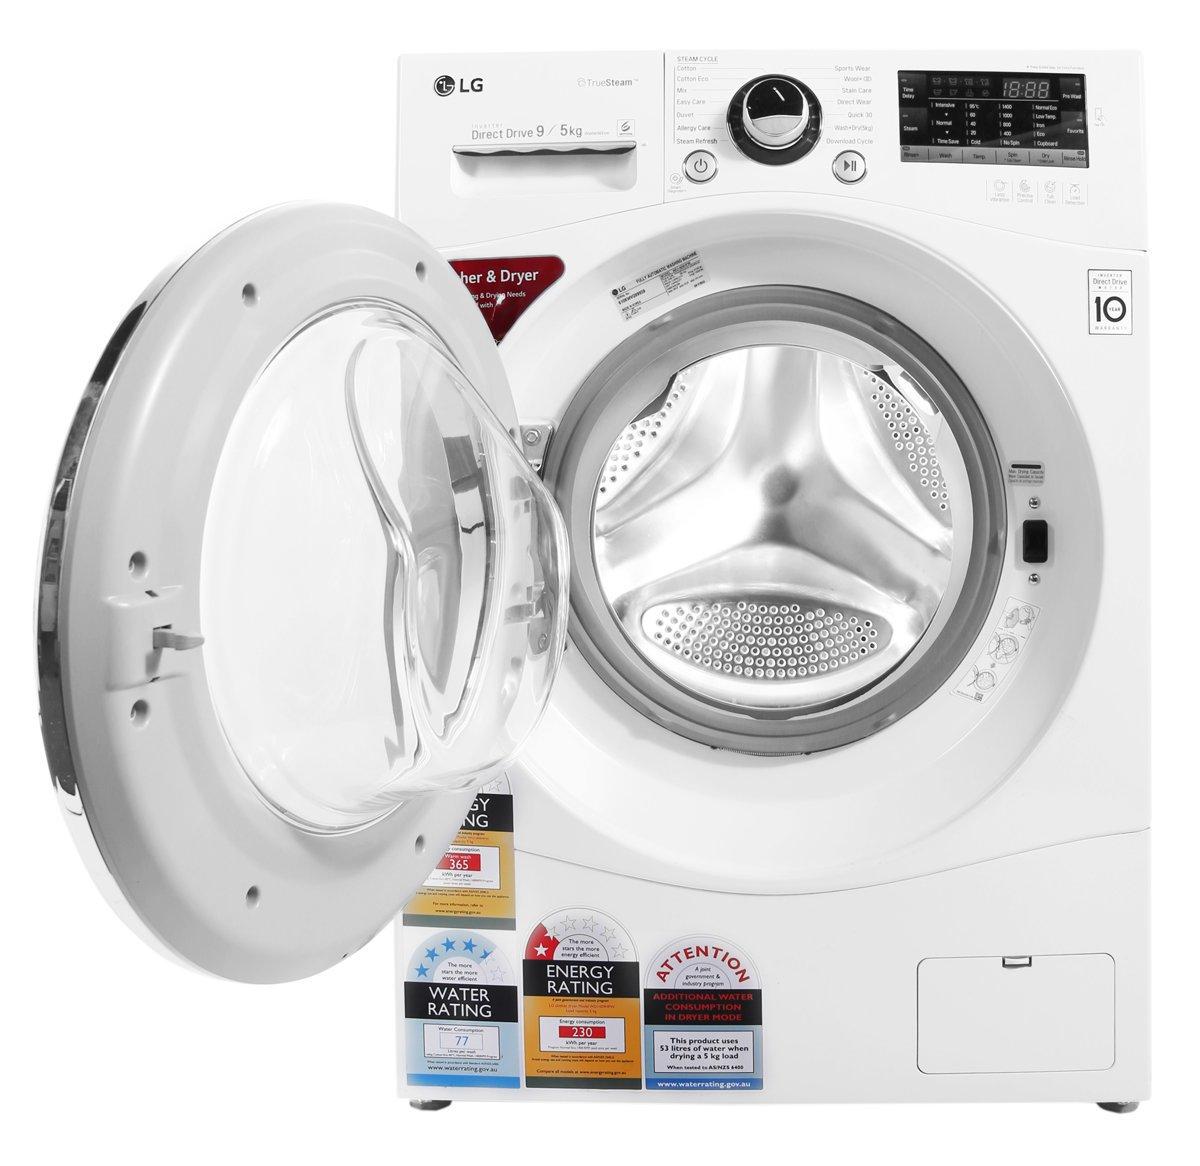 LG WD1409HPW 9kg Washer 5kg Dryer Combo Front Open high.jpeg